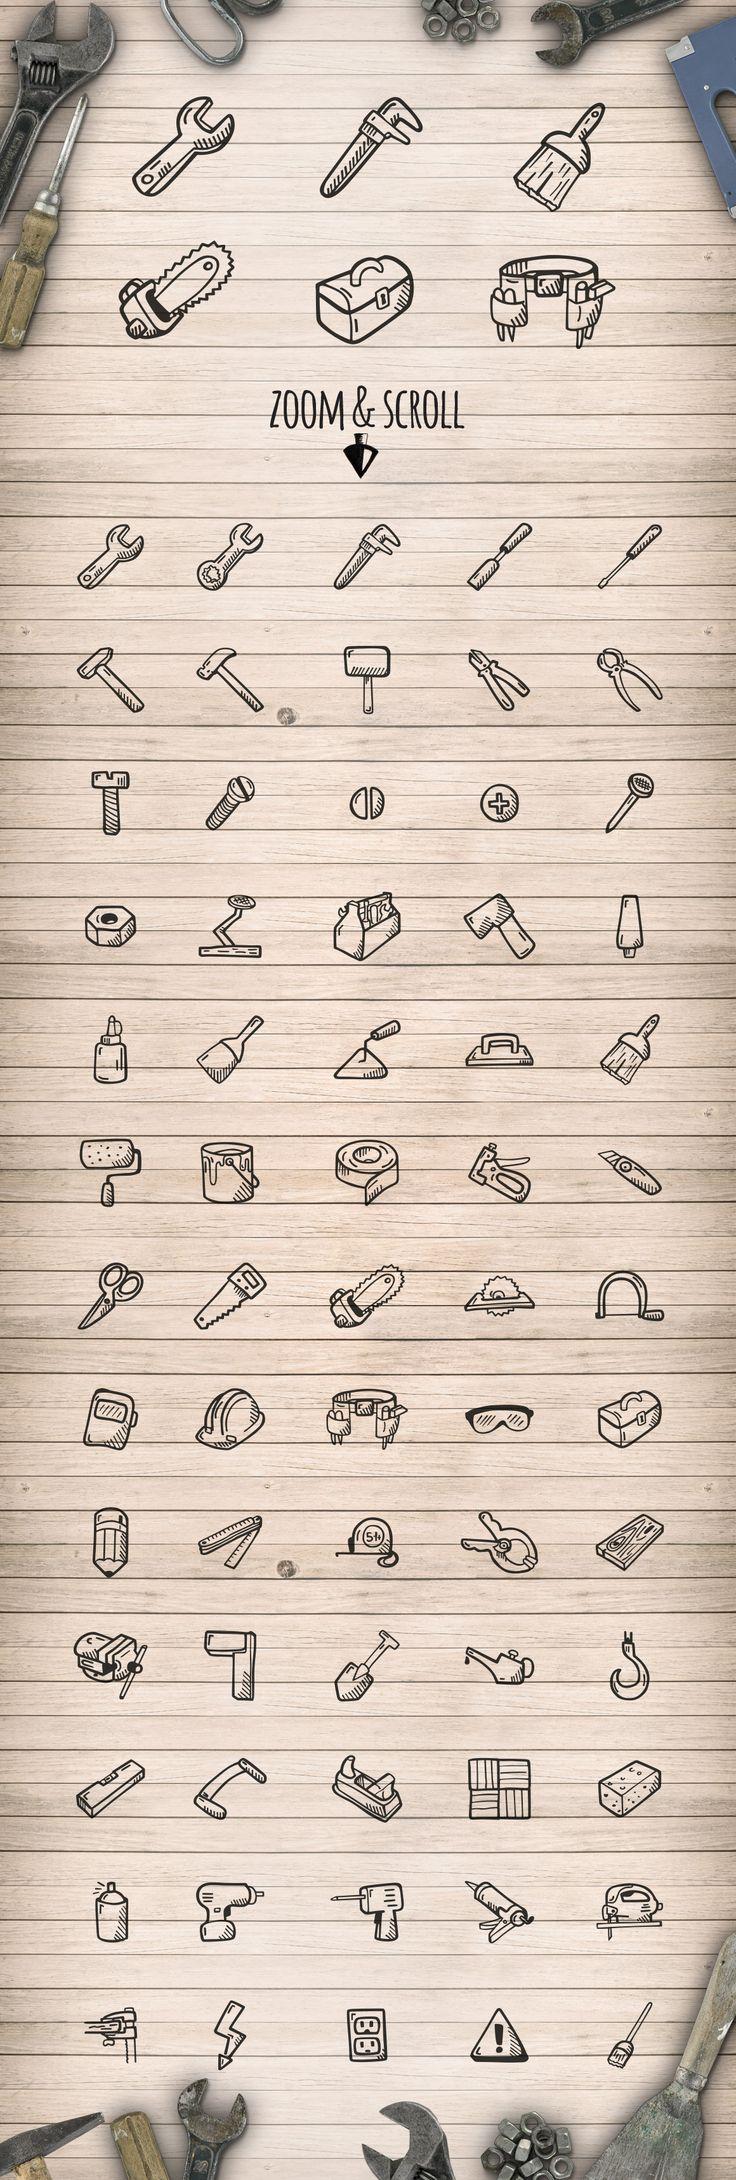 Wireless icon line iconset iconsmind - Tools Hand Drawn Icons